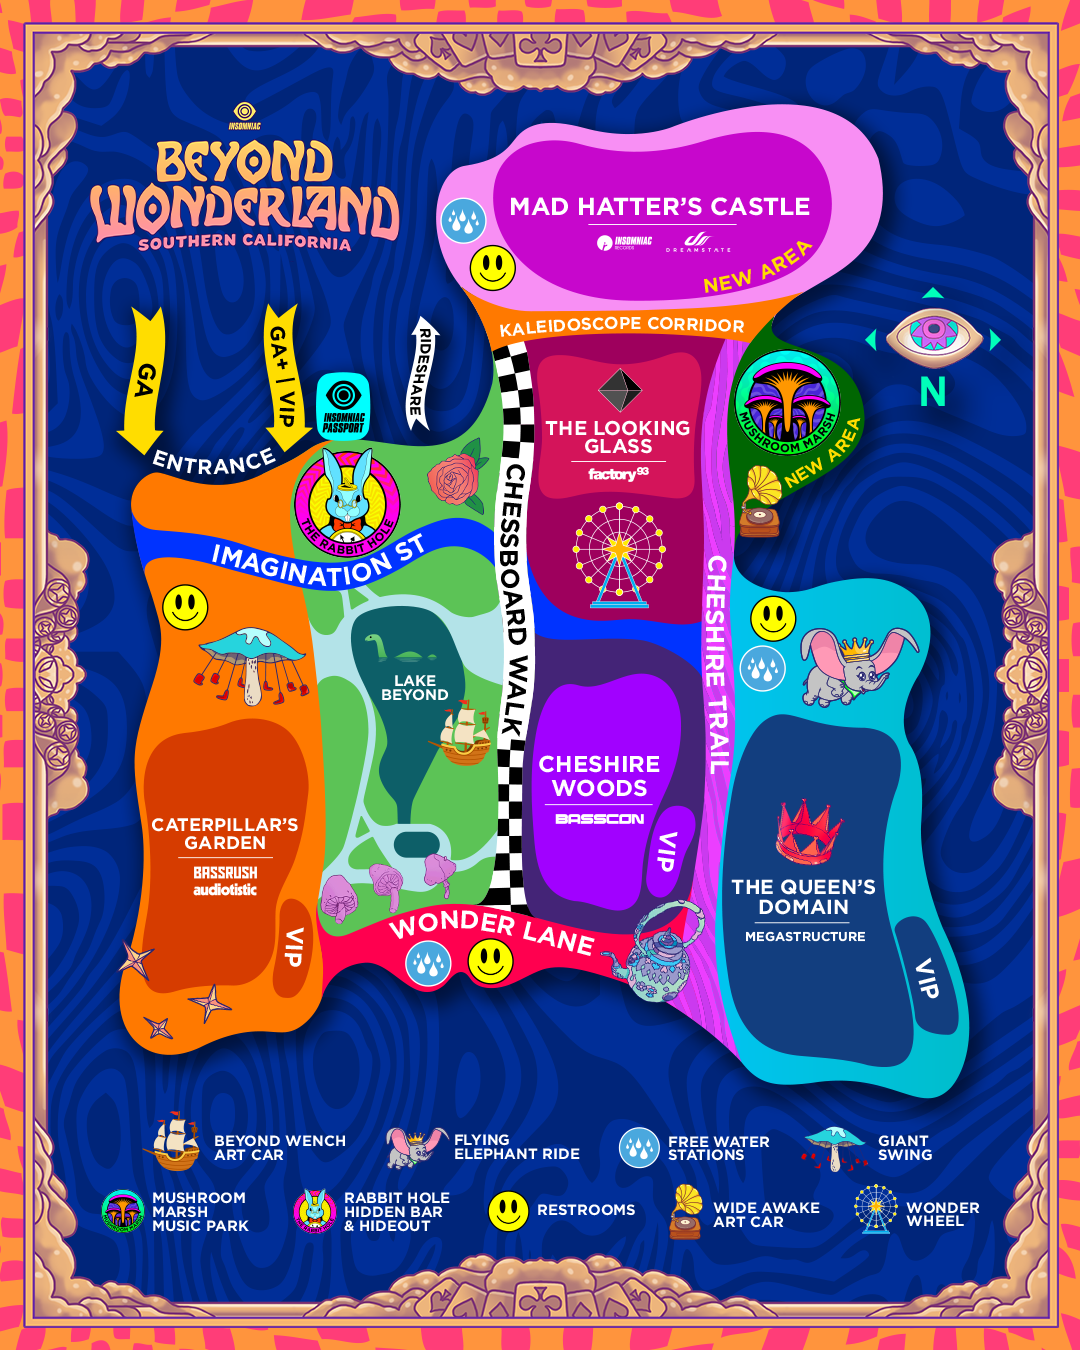 beyond wonderland festival map